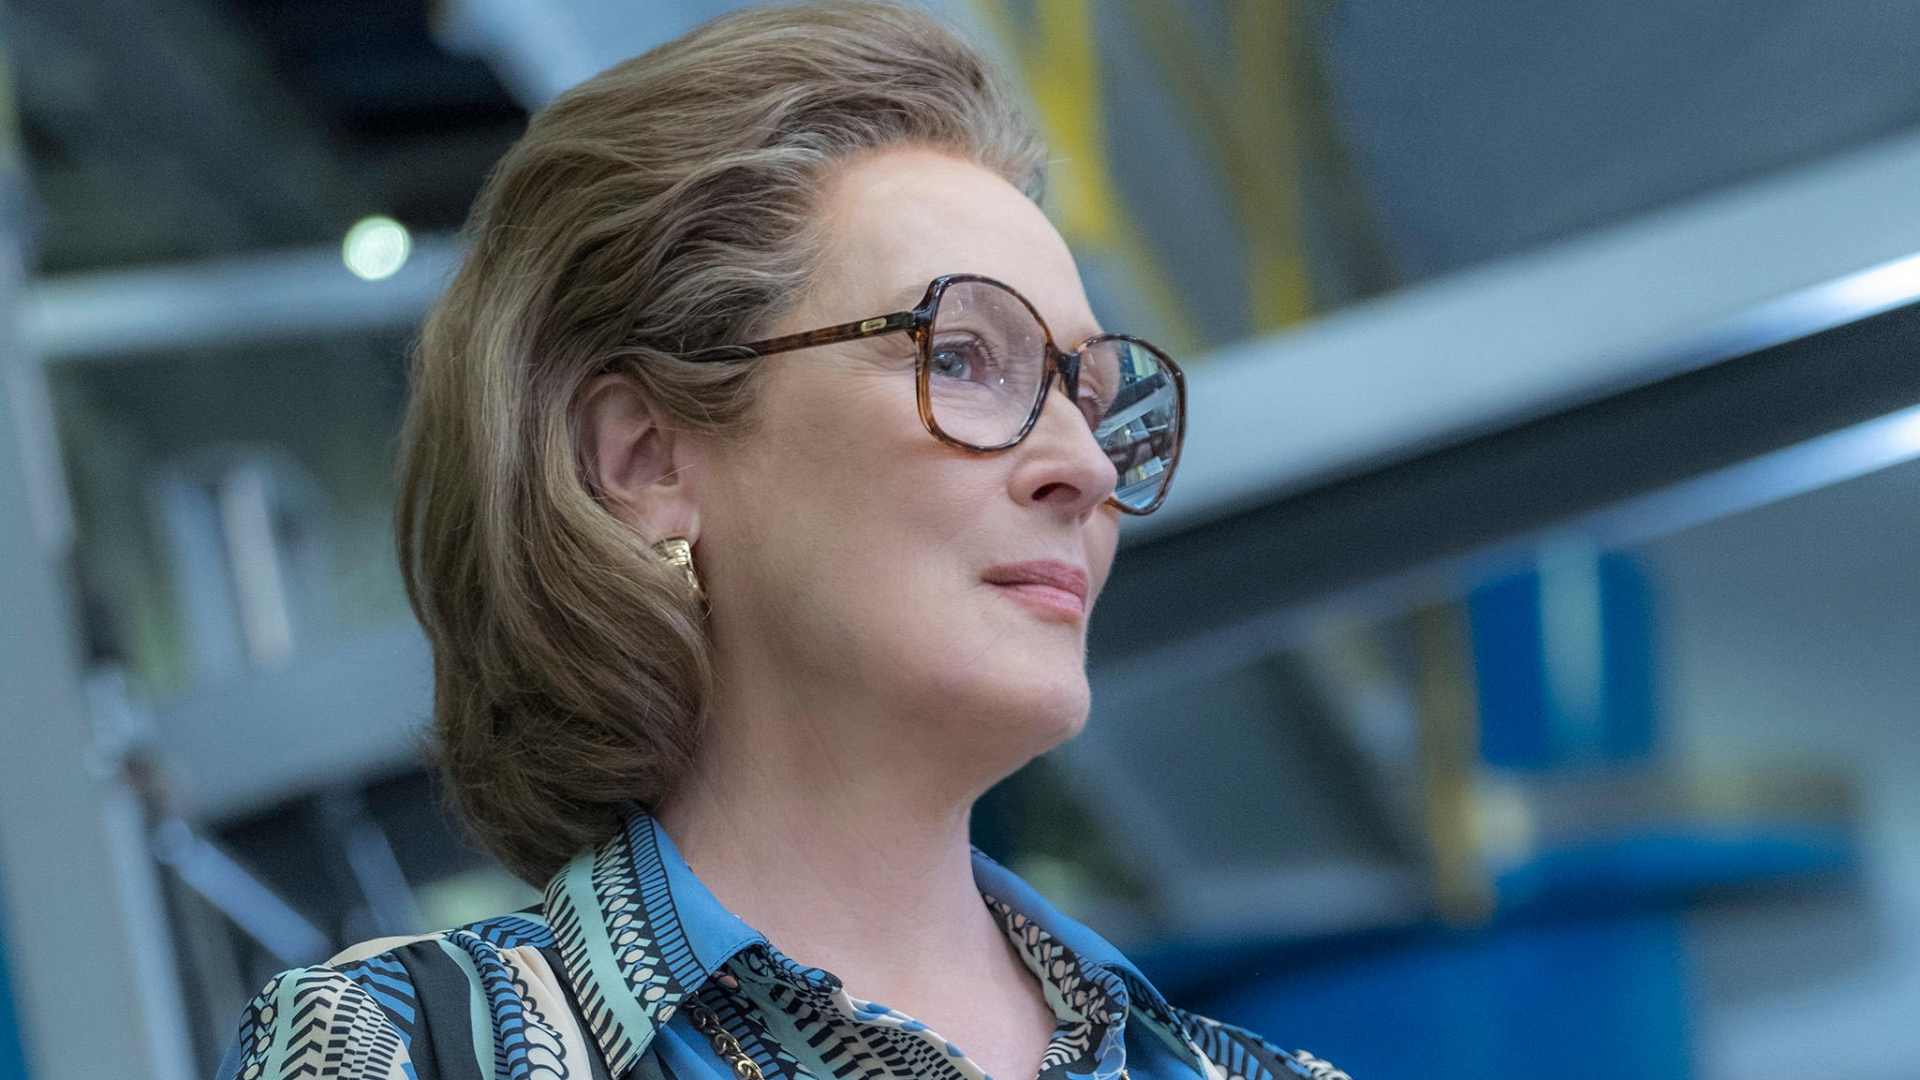 Meryl Streep as Katherine Graham in The Post. (Credit: Twentieth Century Fox/Entertainment Pictures/Alamy Stock Photo)